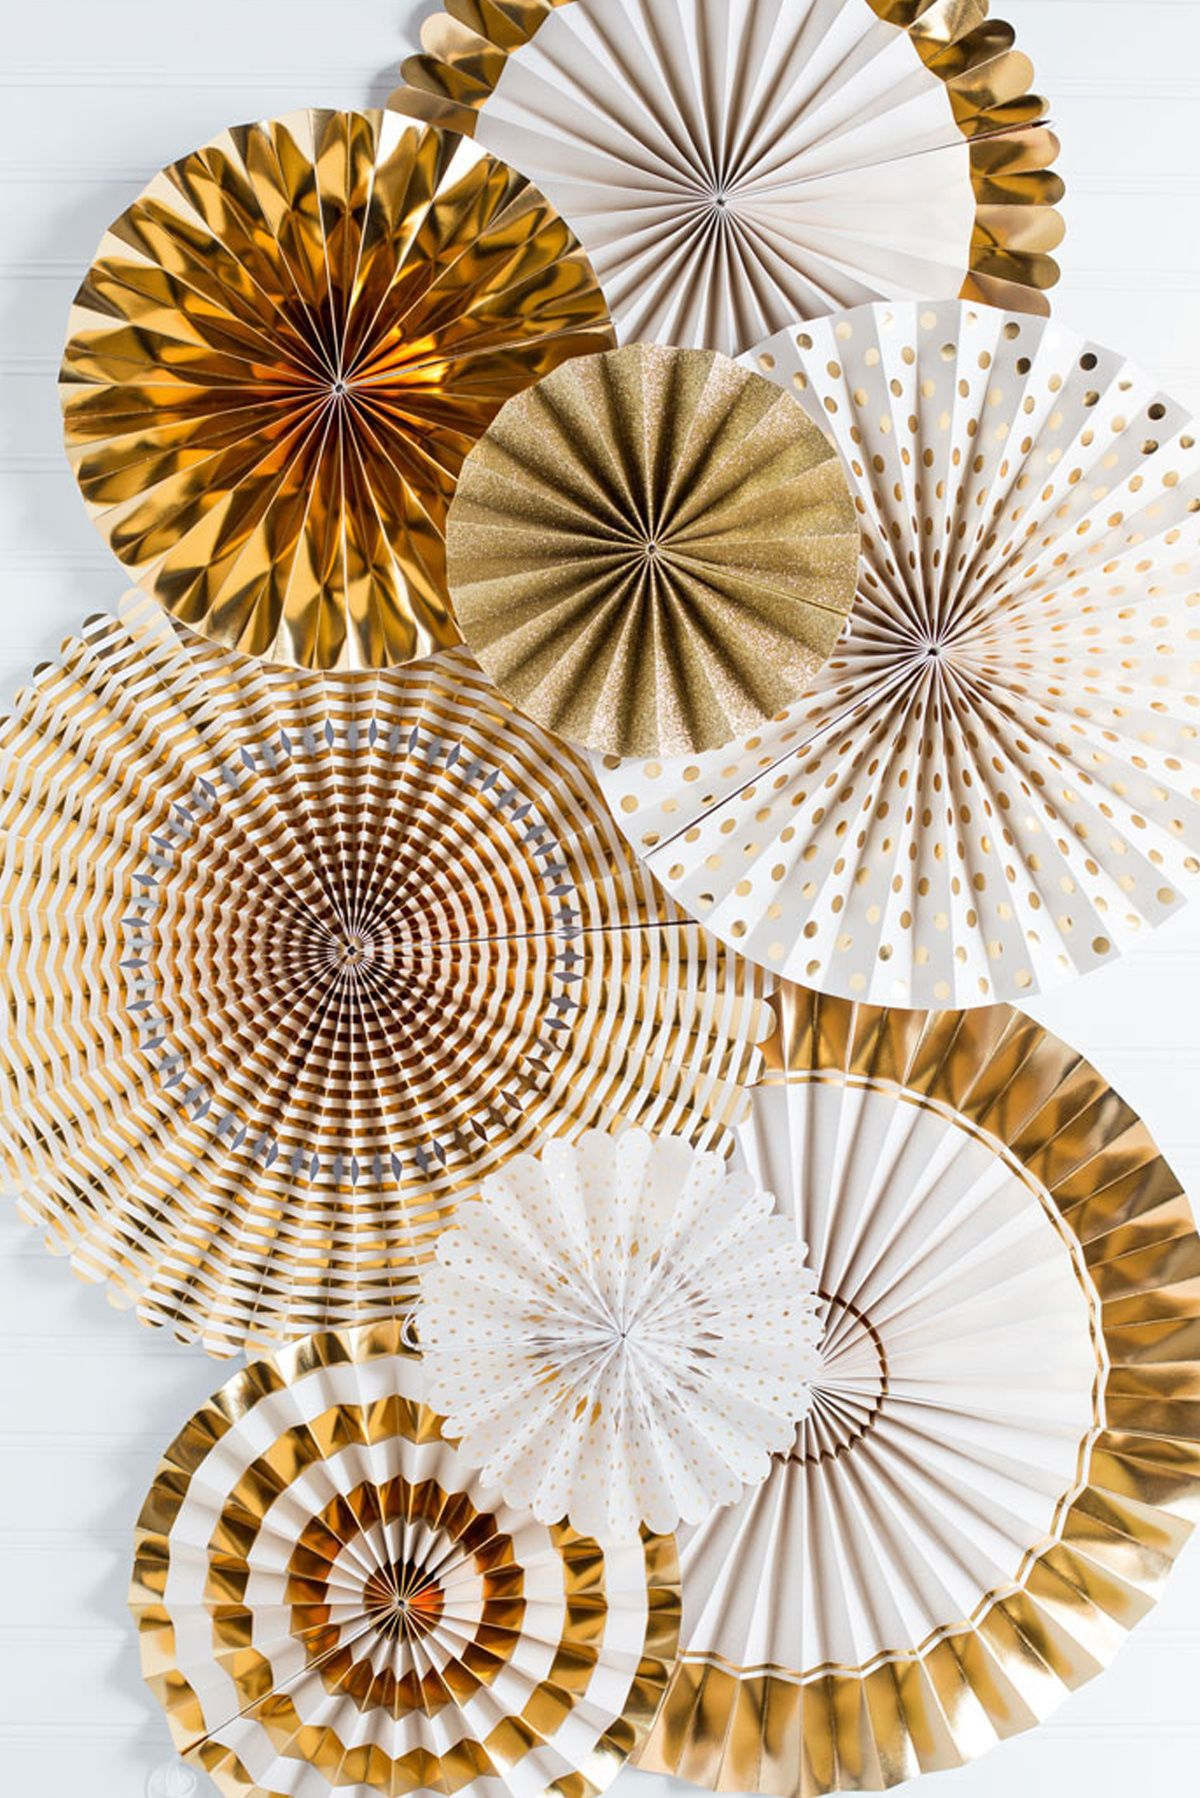 fancy party fans rosette pinwheels gold white wedding decorations 8 fans mme - Gold Decorations